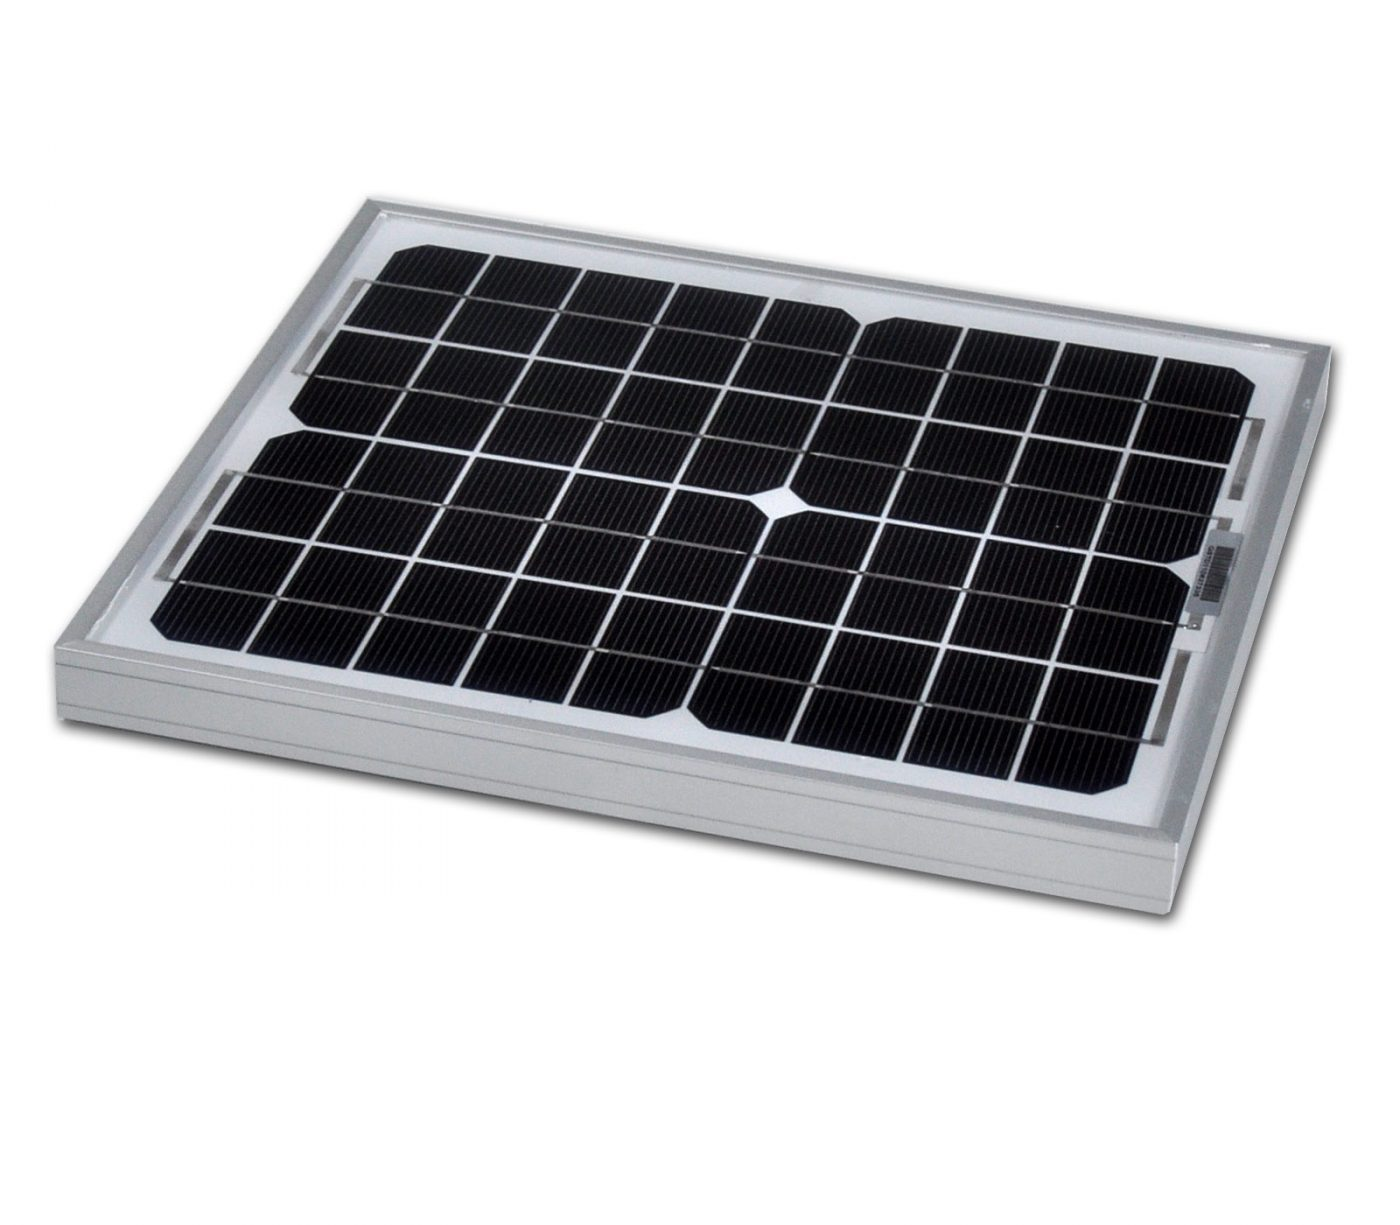 12v 10w solar panel monocrystalline 335x280 sunstore solar. Black Bedroom Furniture Sets. Home Design Ideas